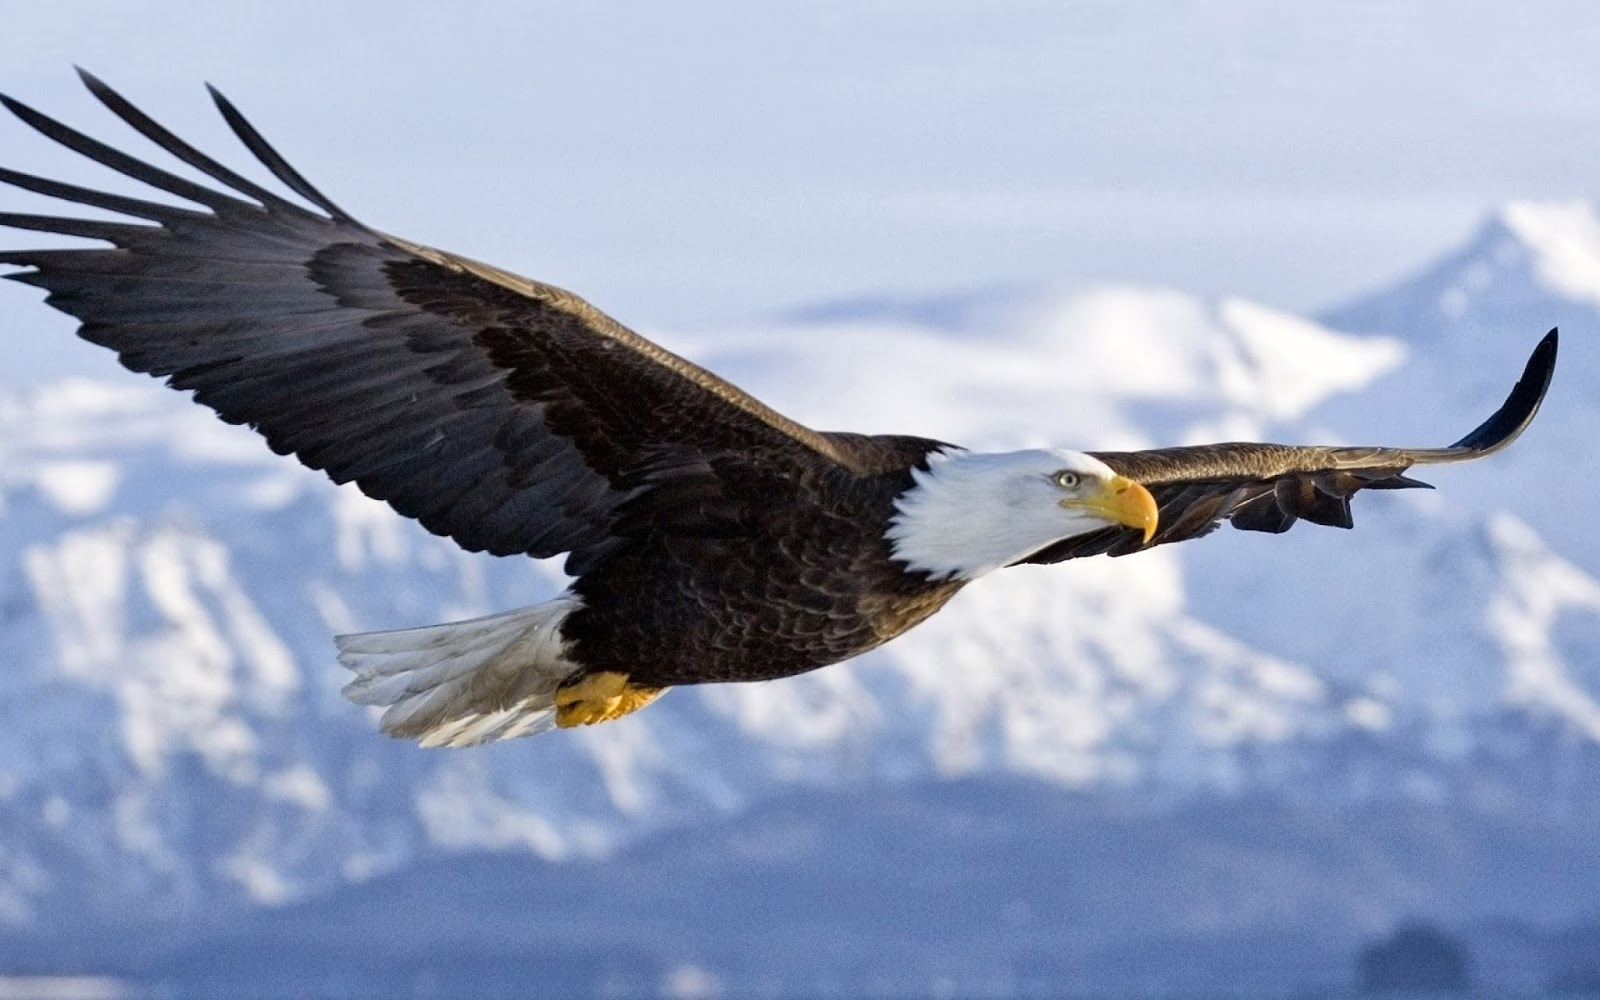 HD Wallpapers 4 u Download 3D Flying Bald Eagle HD Wallpaper 1600x1000